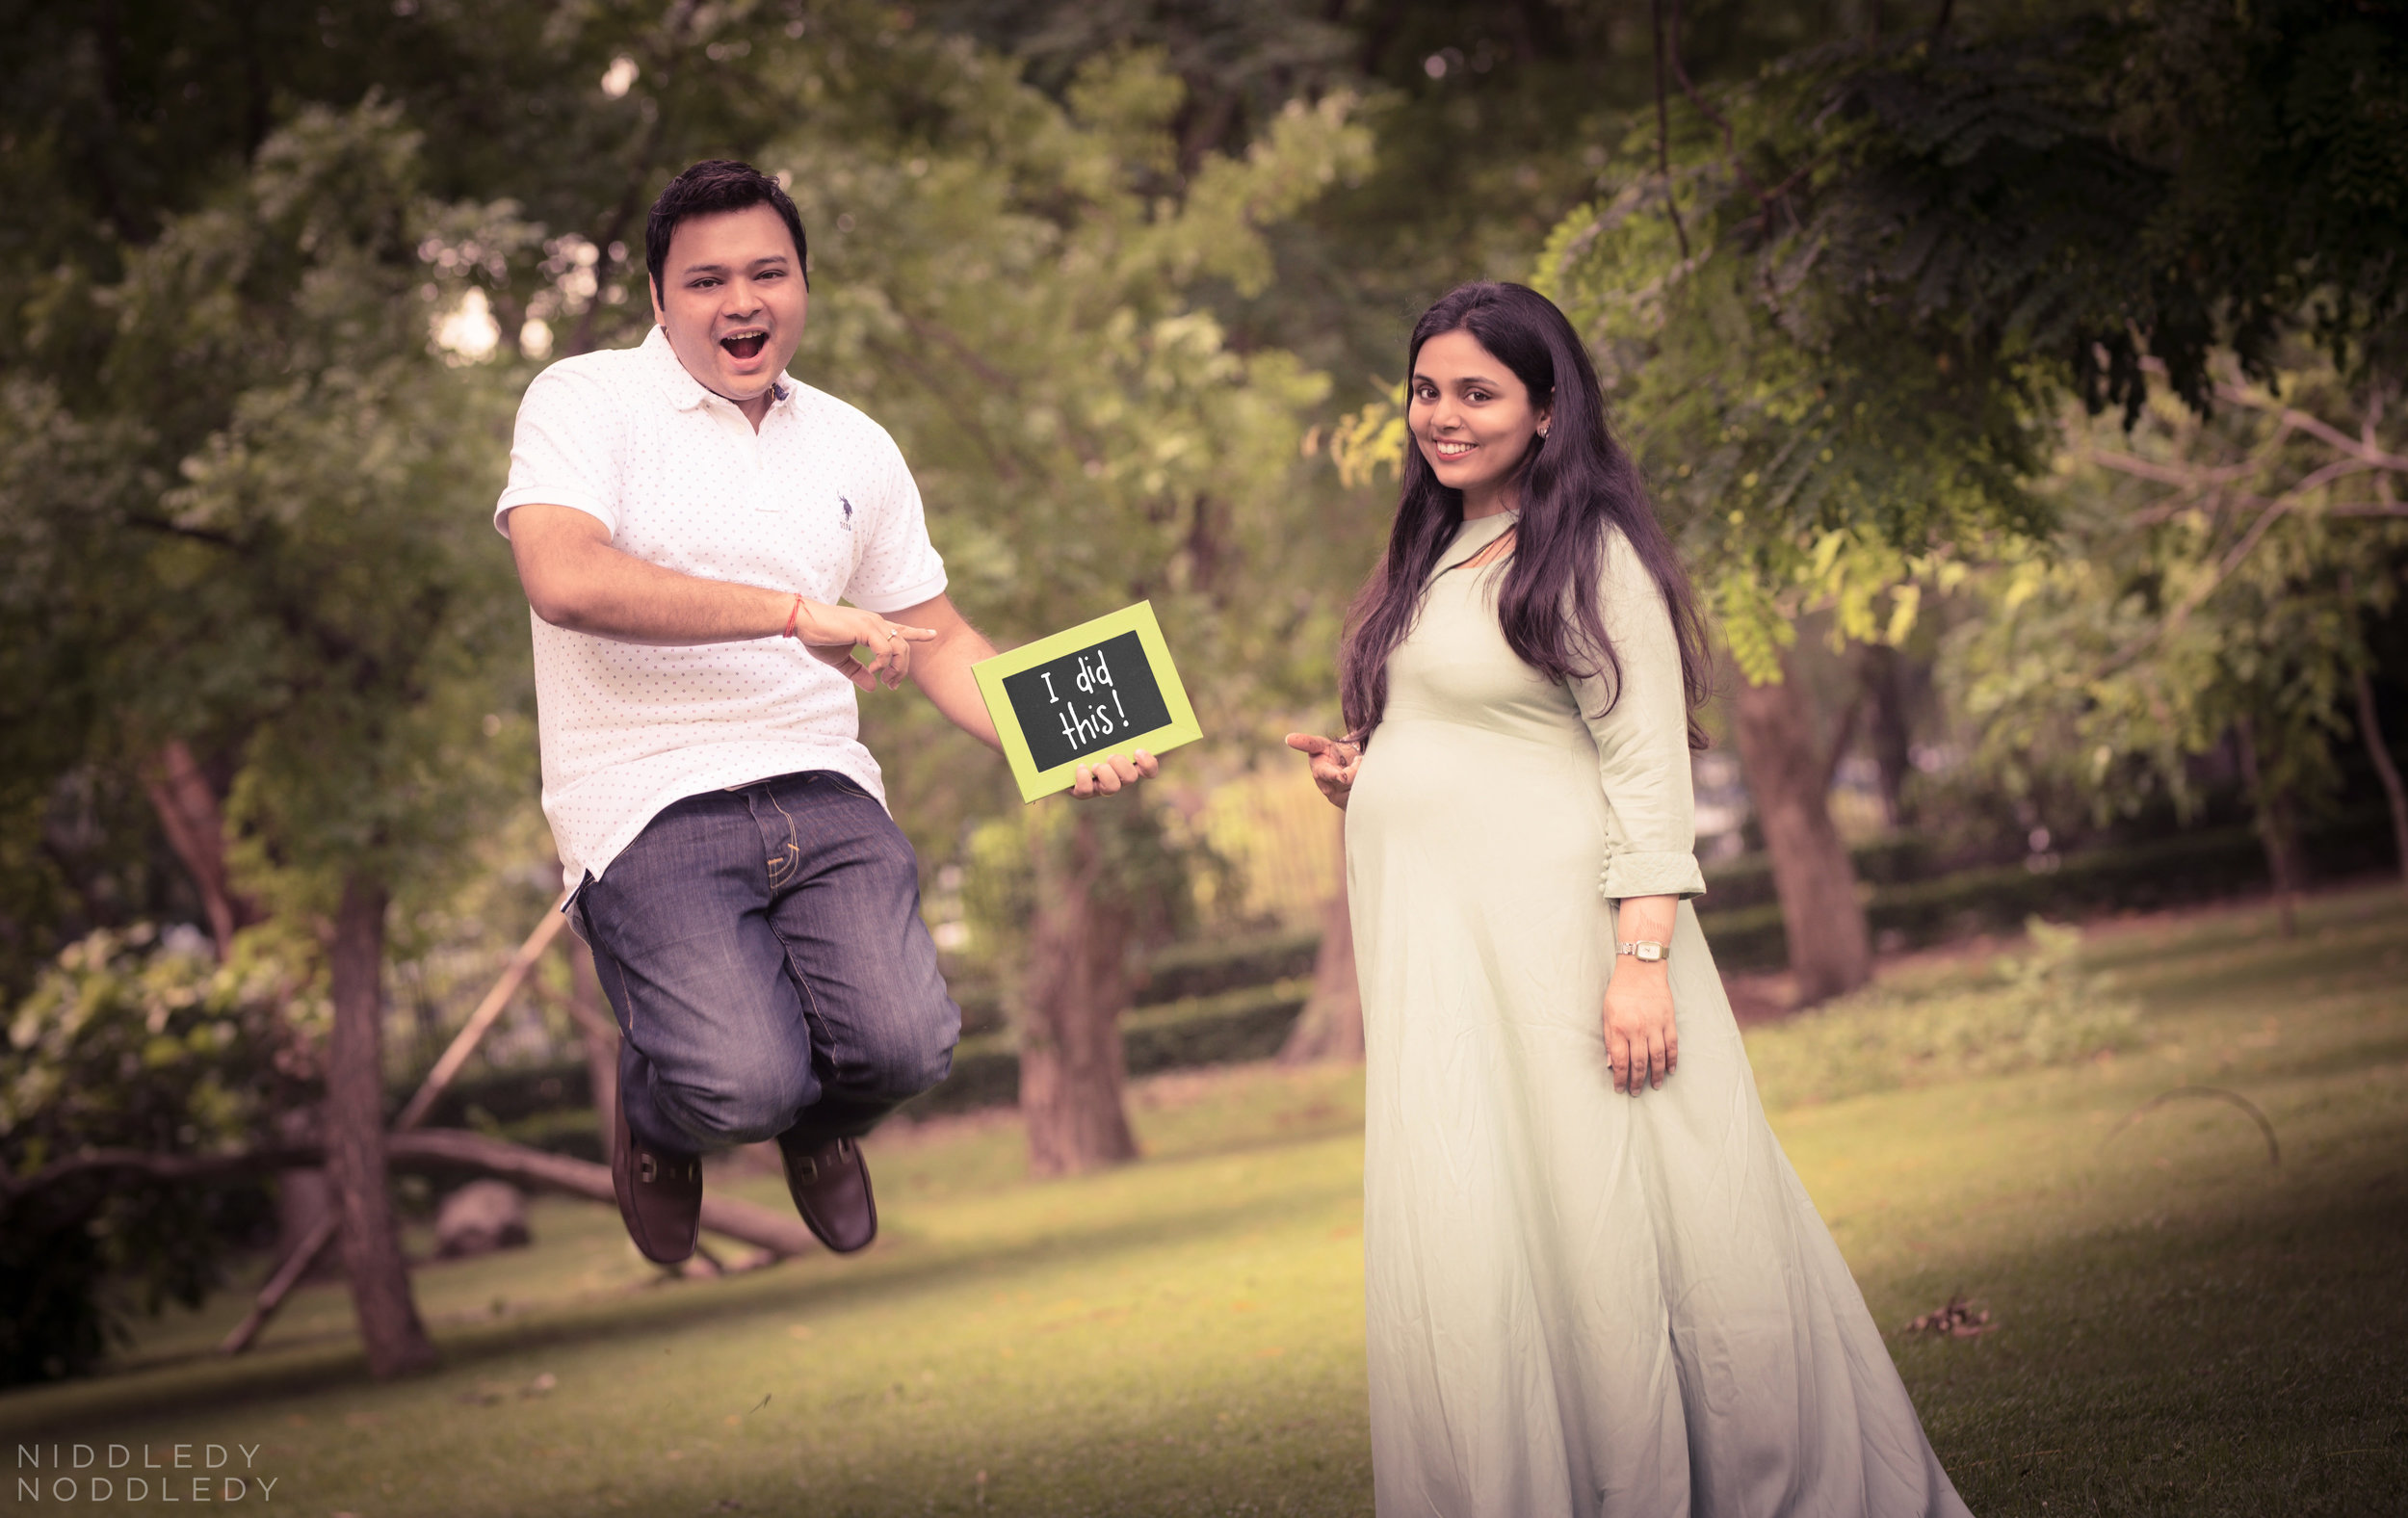 Arpita Maternity Photoshoot ❤ NiddledyNoddledy.com ~ Bumps to Babies Photography, Kolkata - 12.jpg